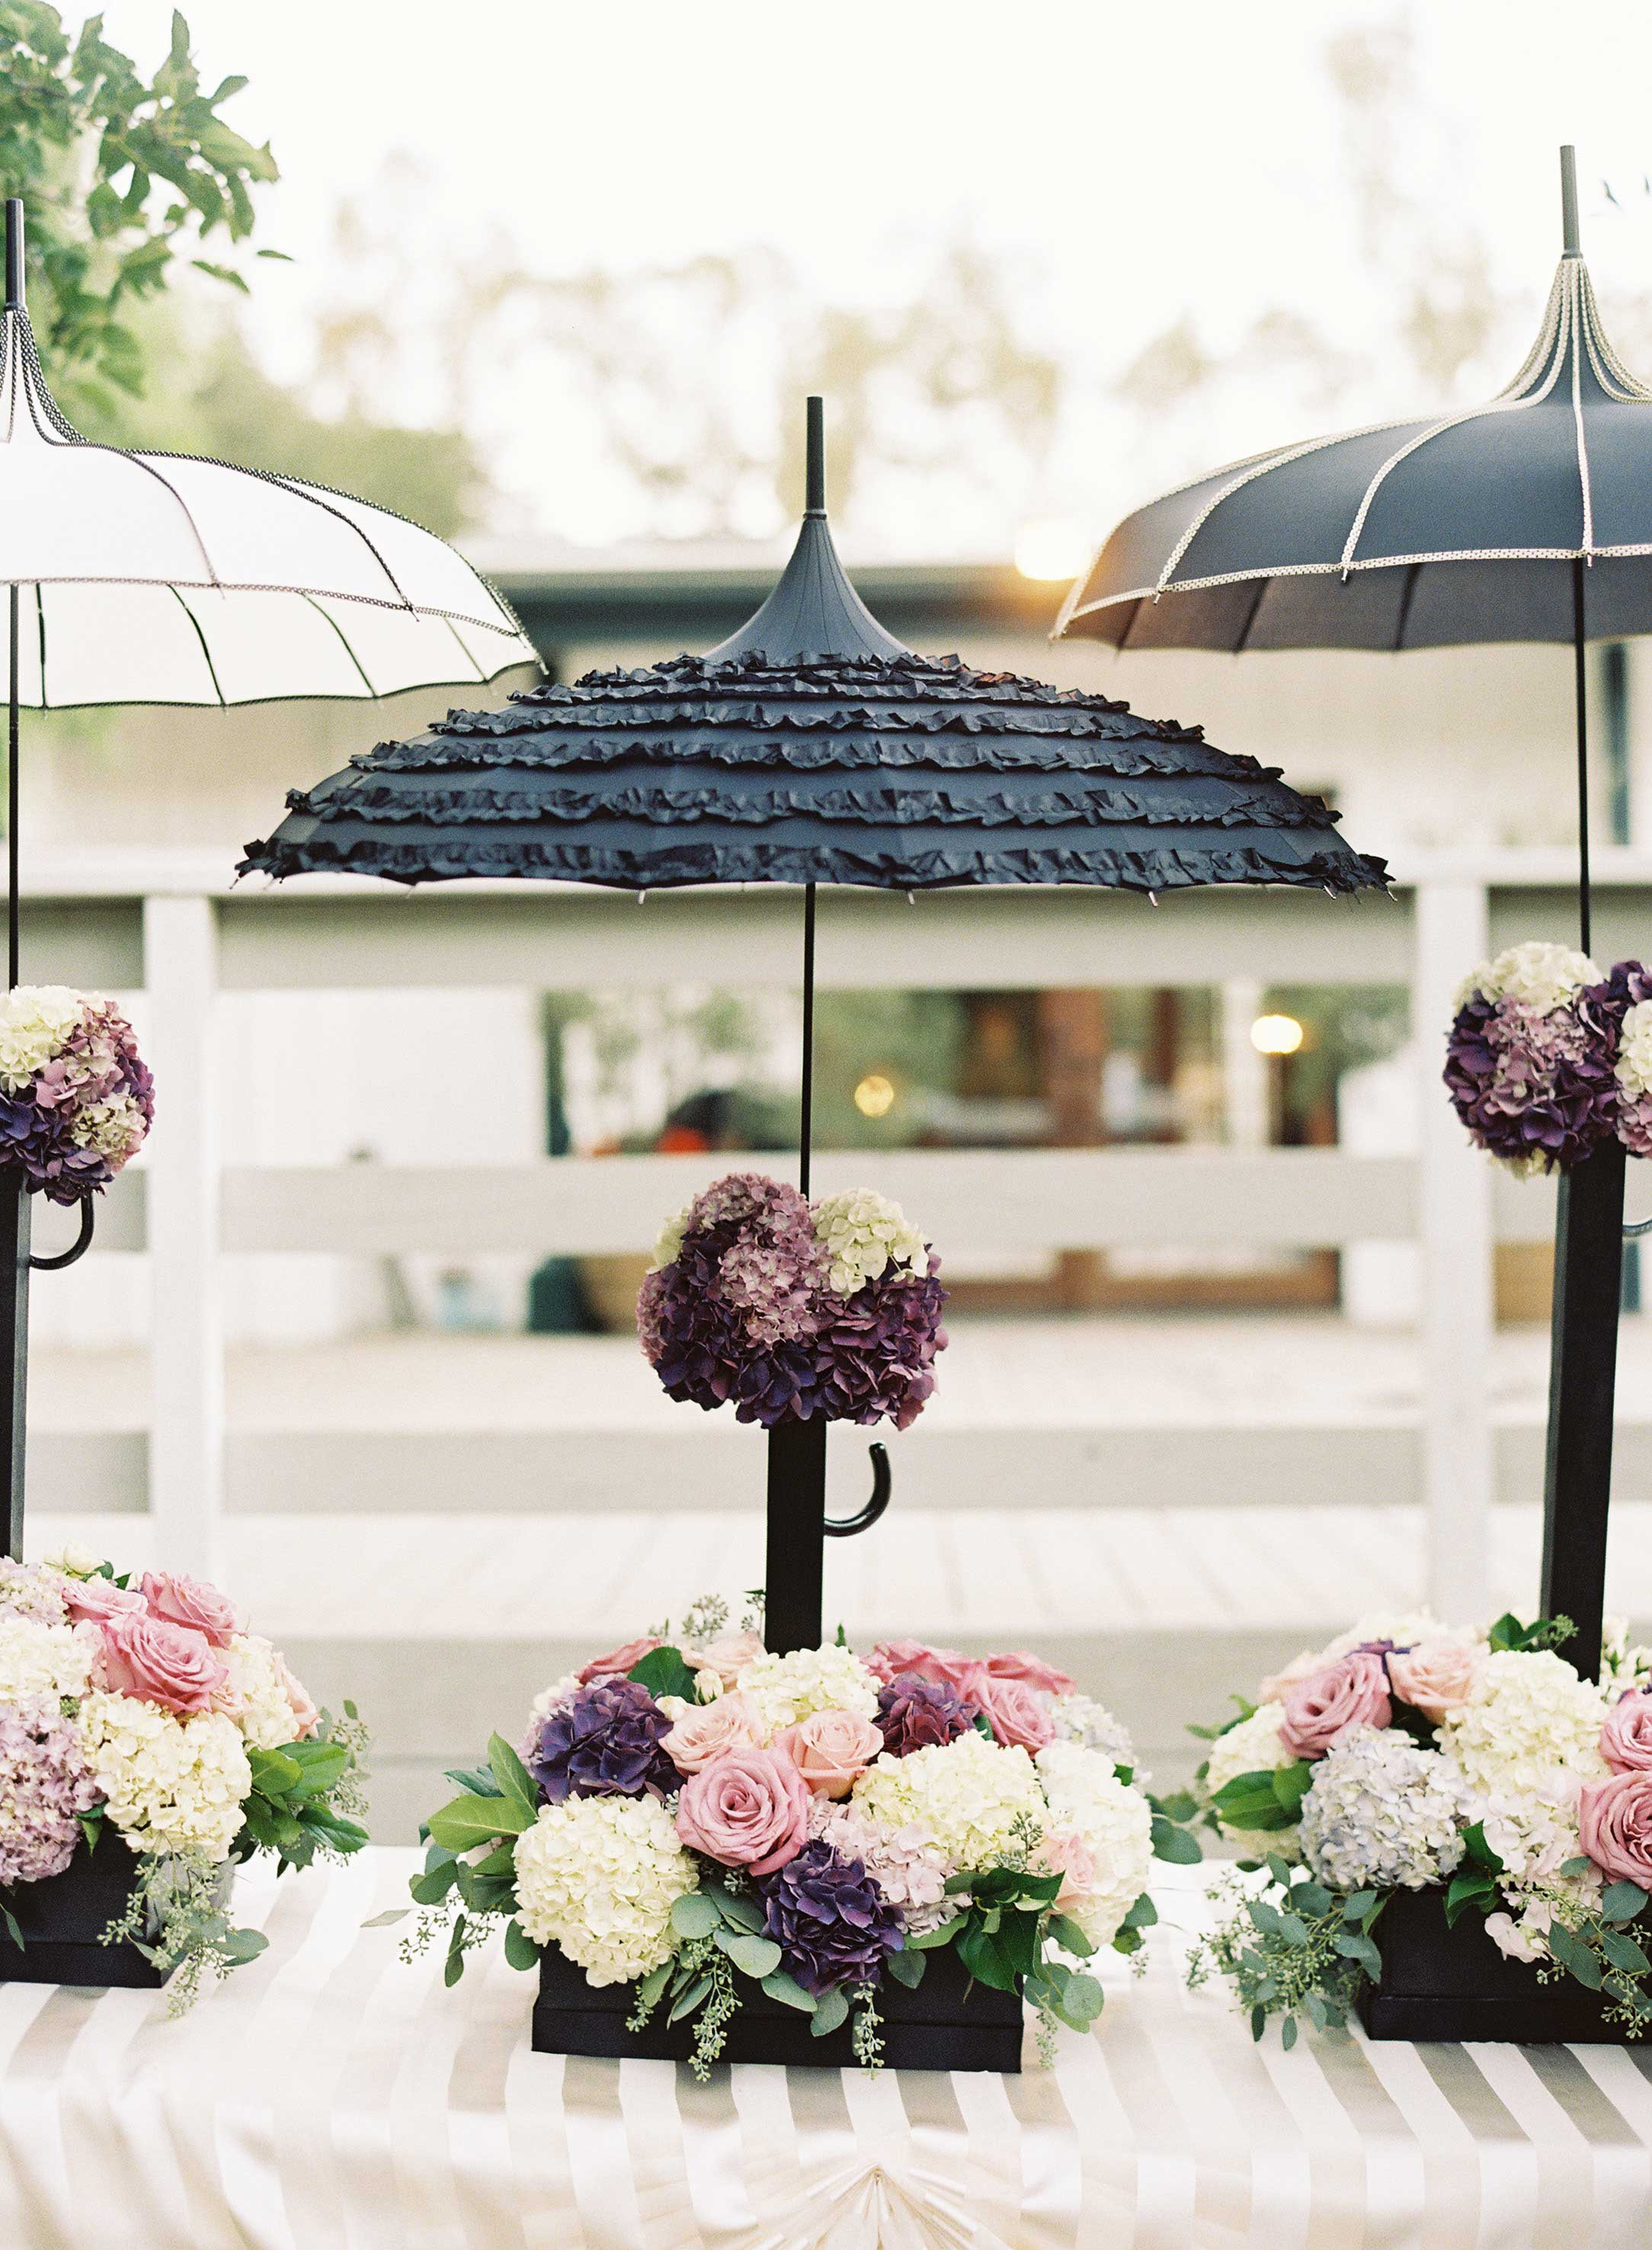 Themed Weddings How To Make Them Elegant Amp Tasteful